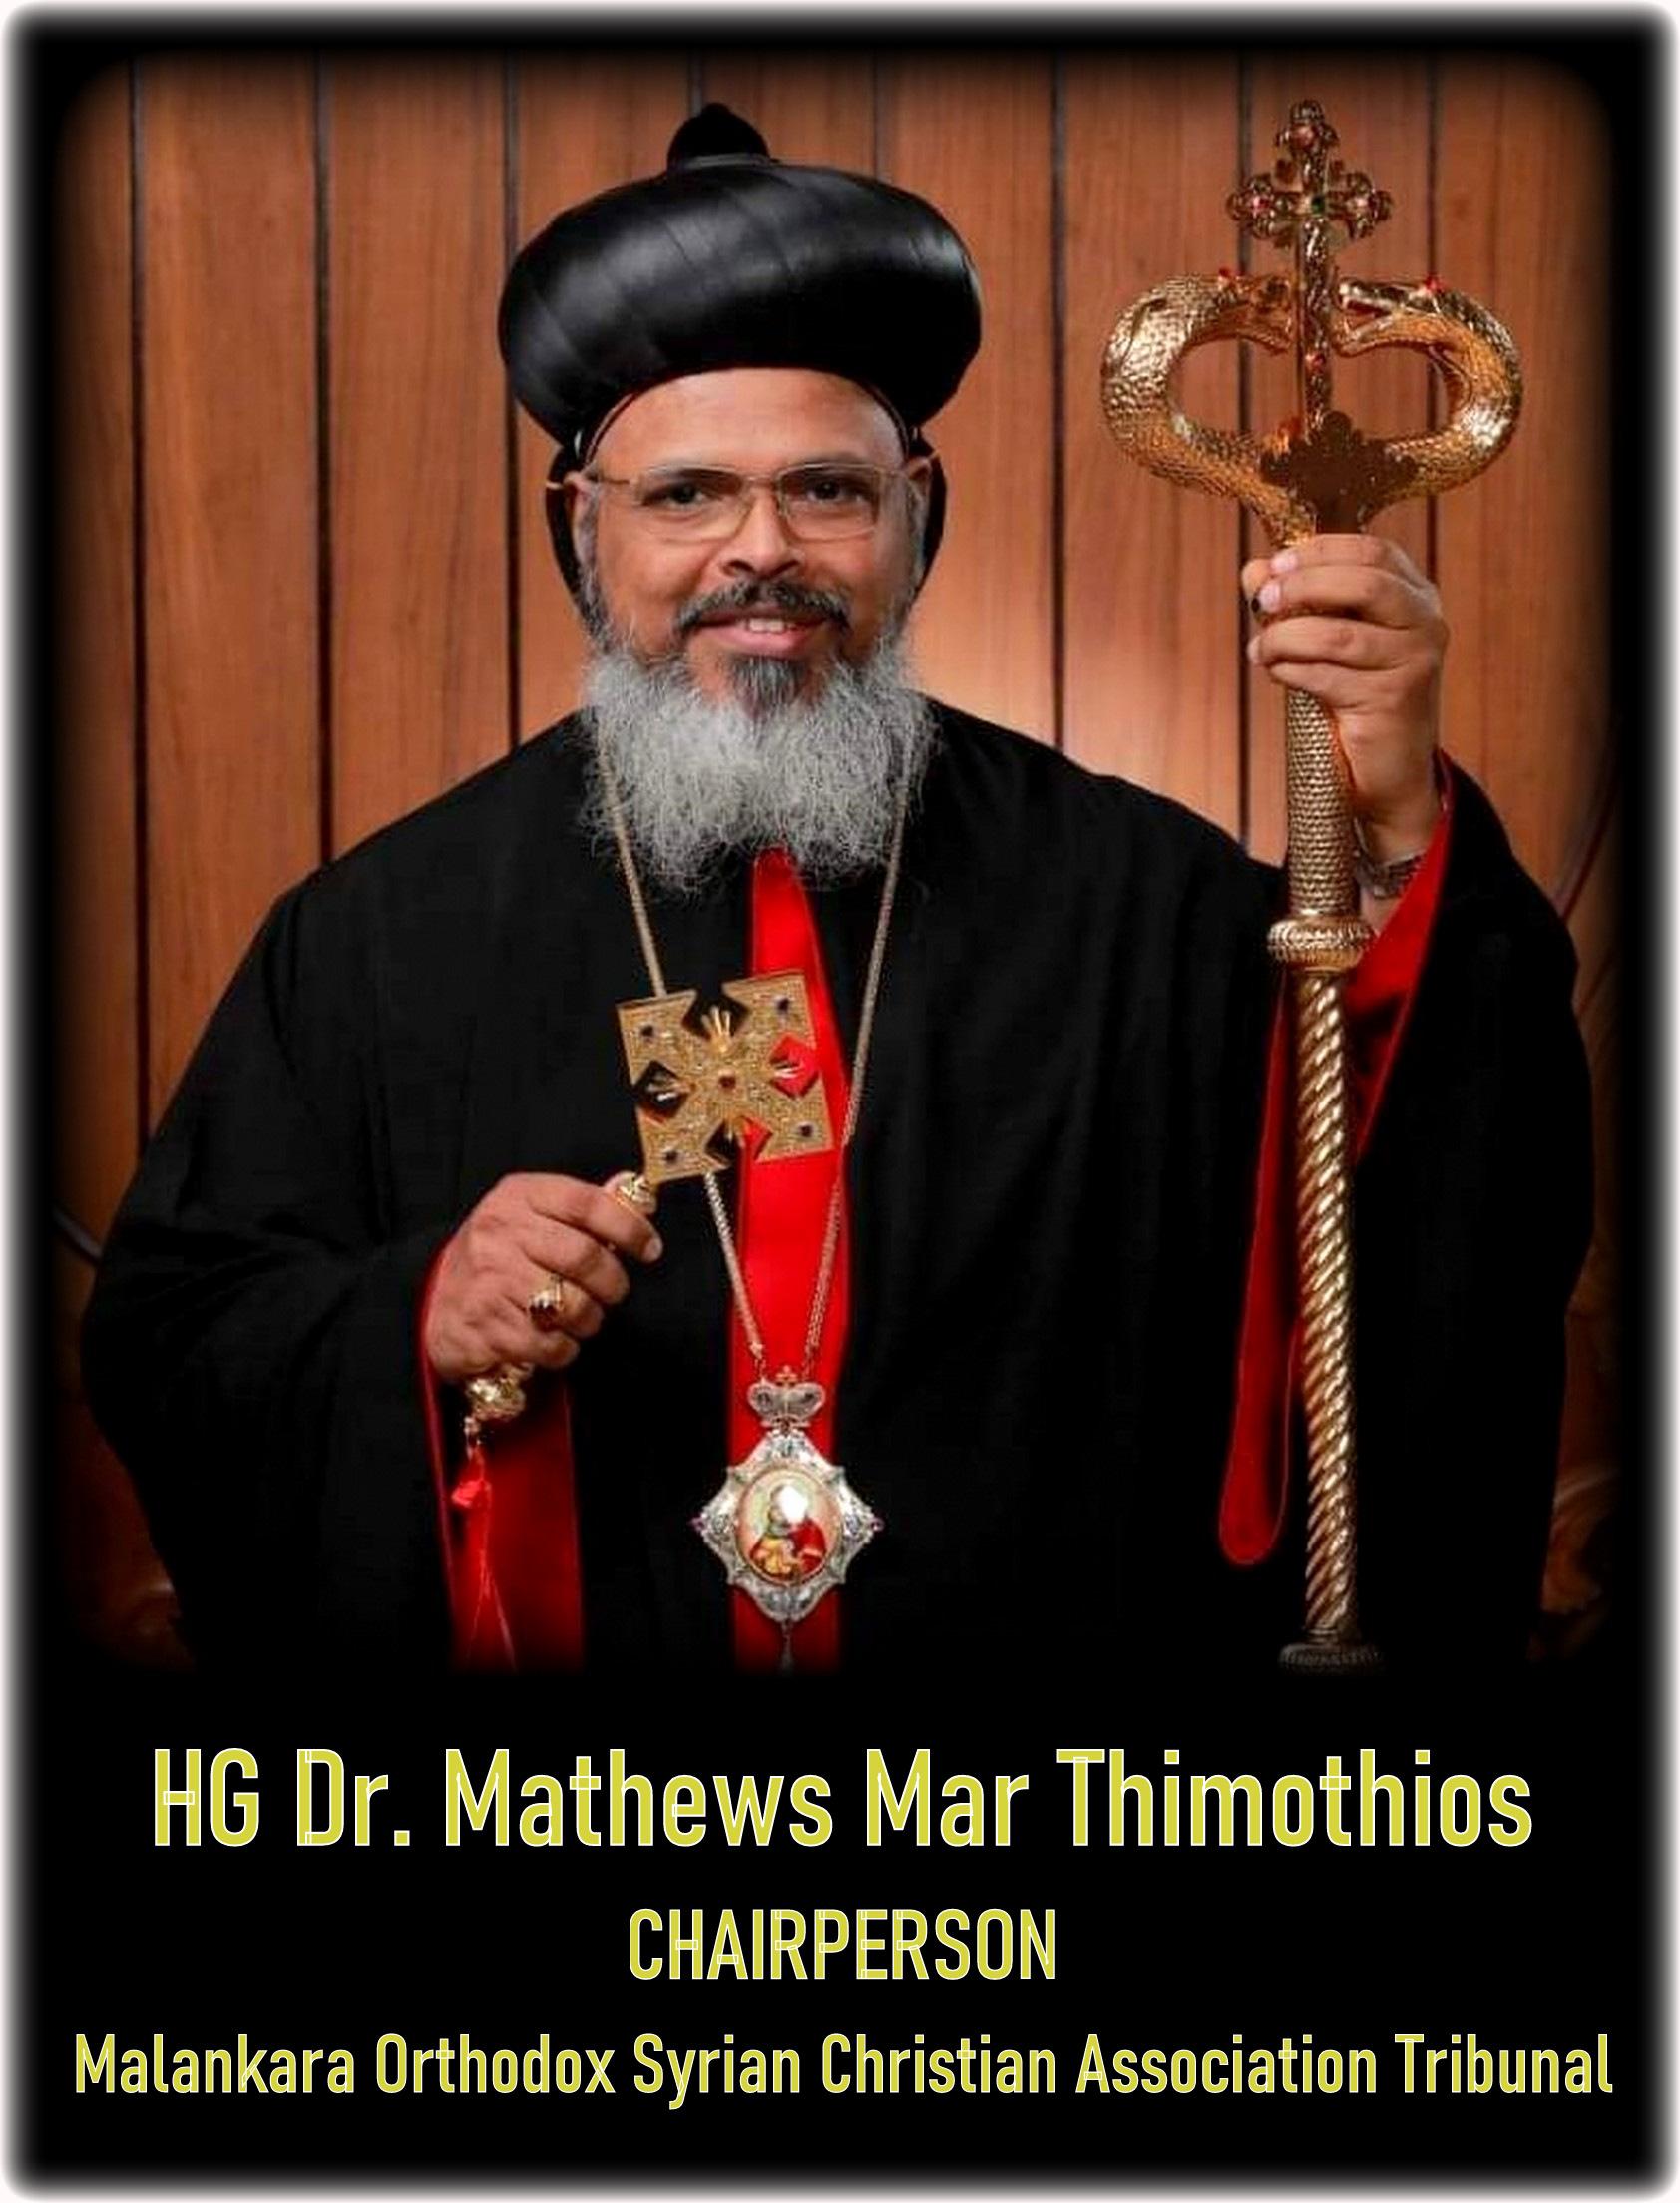 HG Dr. Mathews Mar Thimothios appointed as Malankara Orthodox Syrian Christian Association Tribunal Chairperson